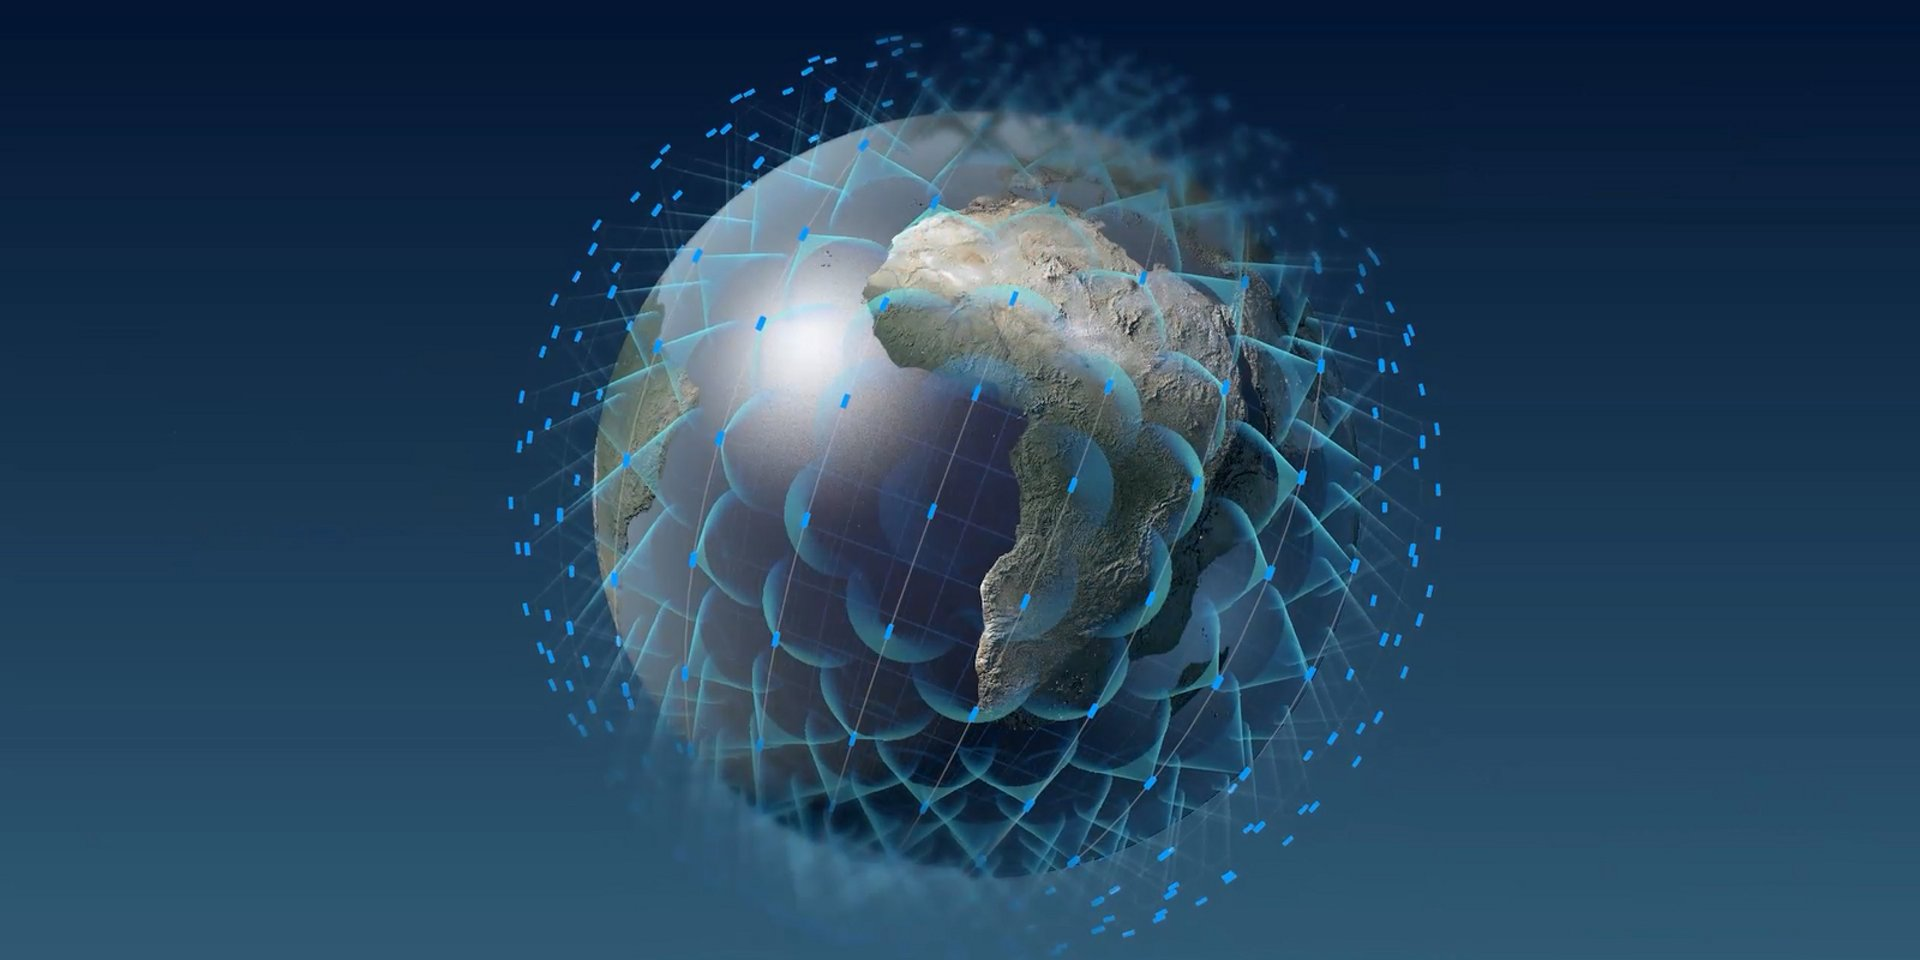 Oneweb-Satellites-Constellation.jpg